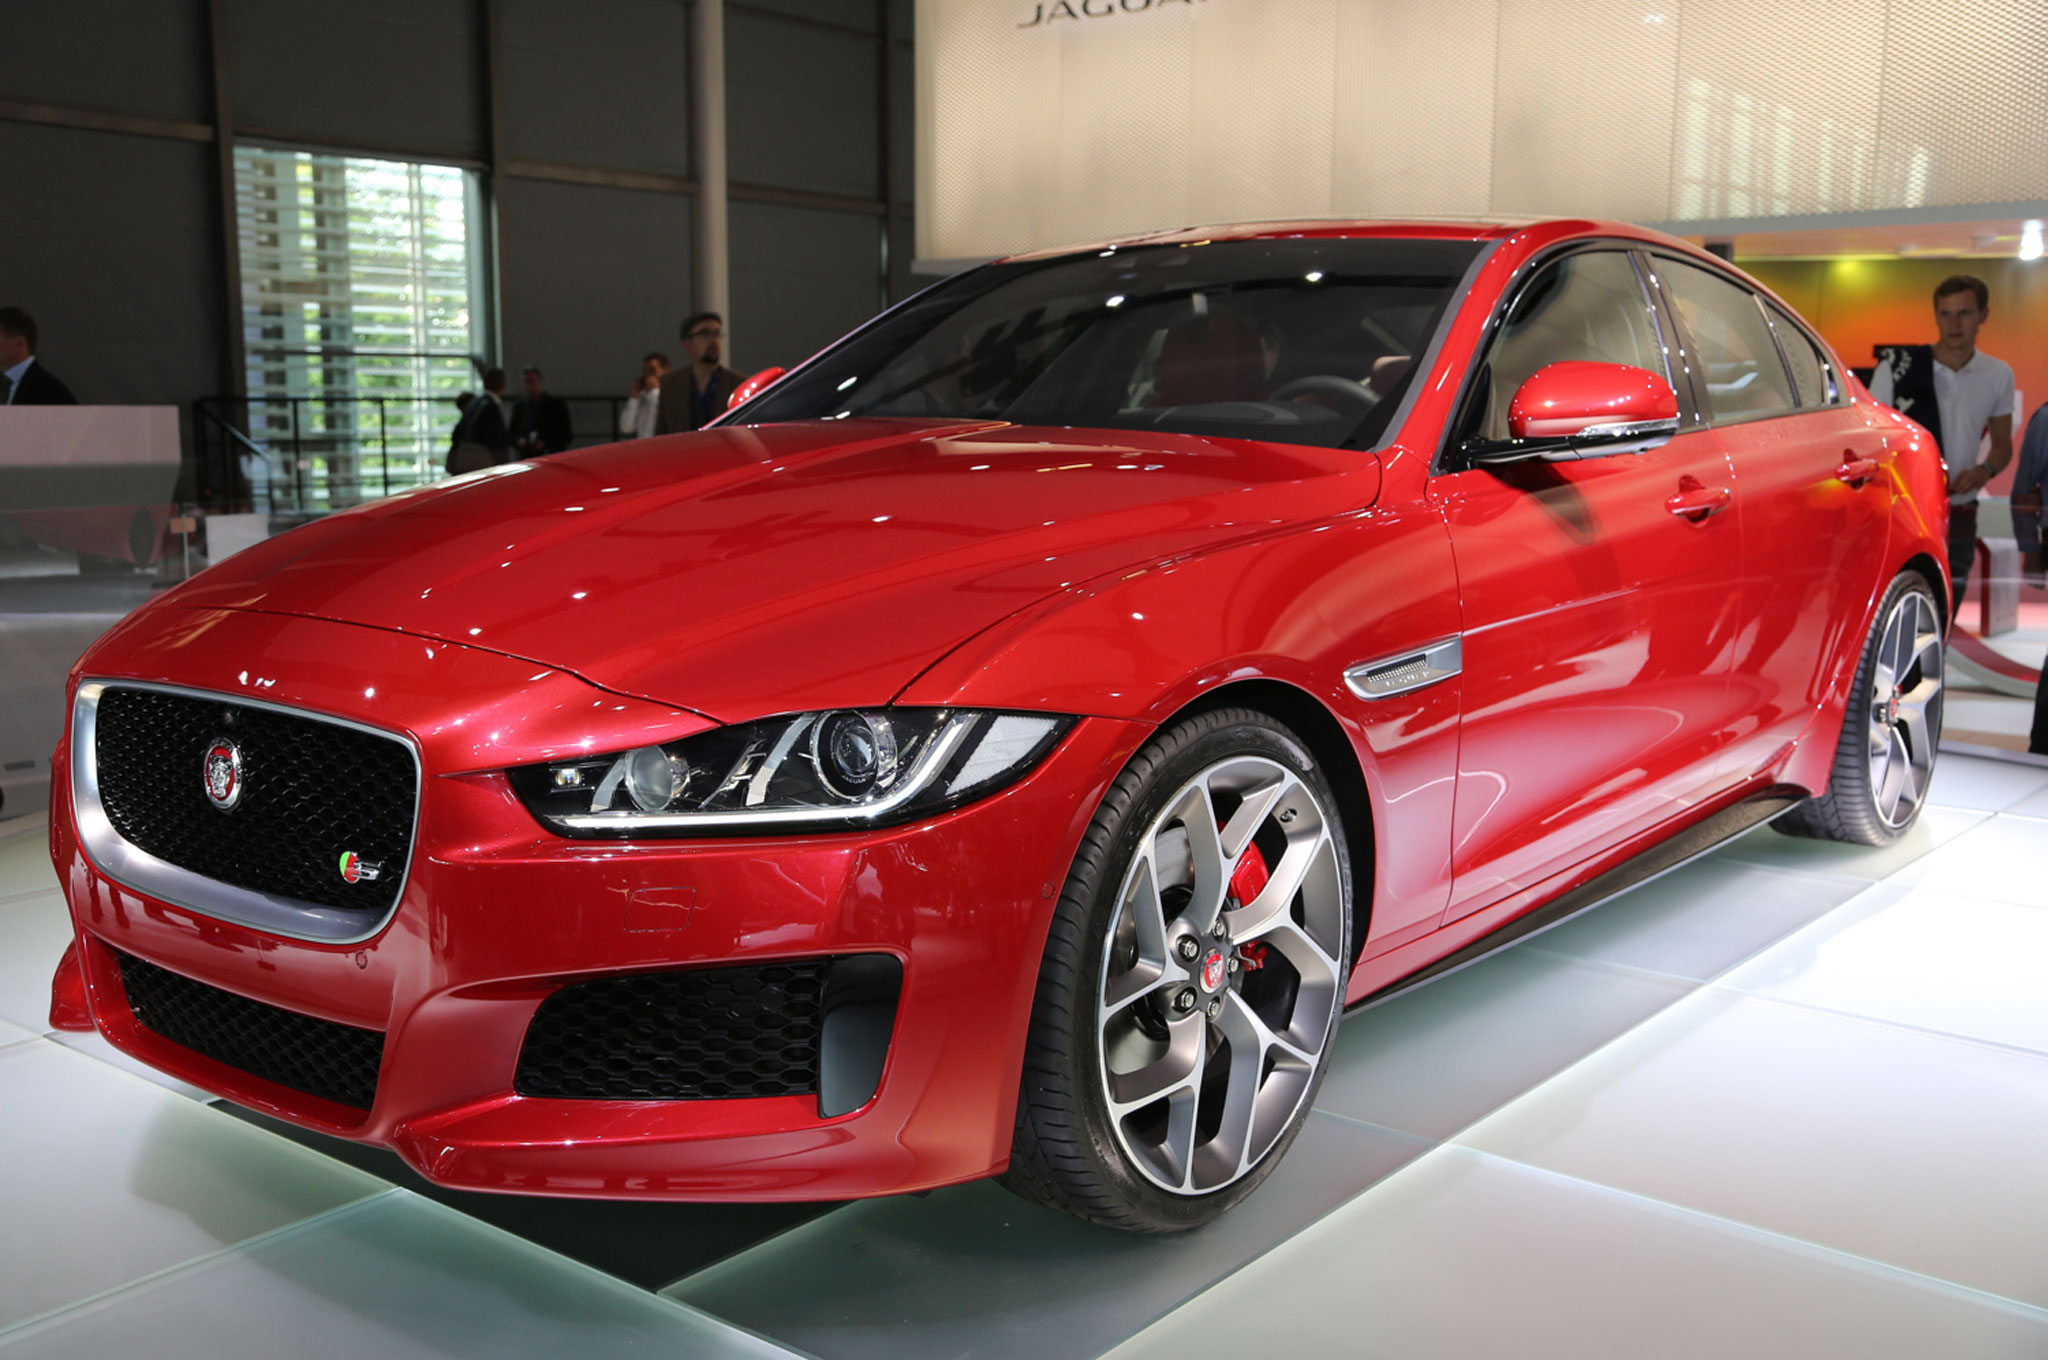 2016 Jaguar XE HD Photo